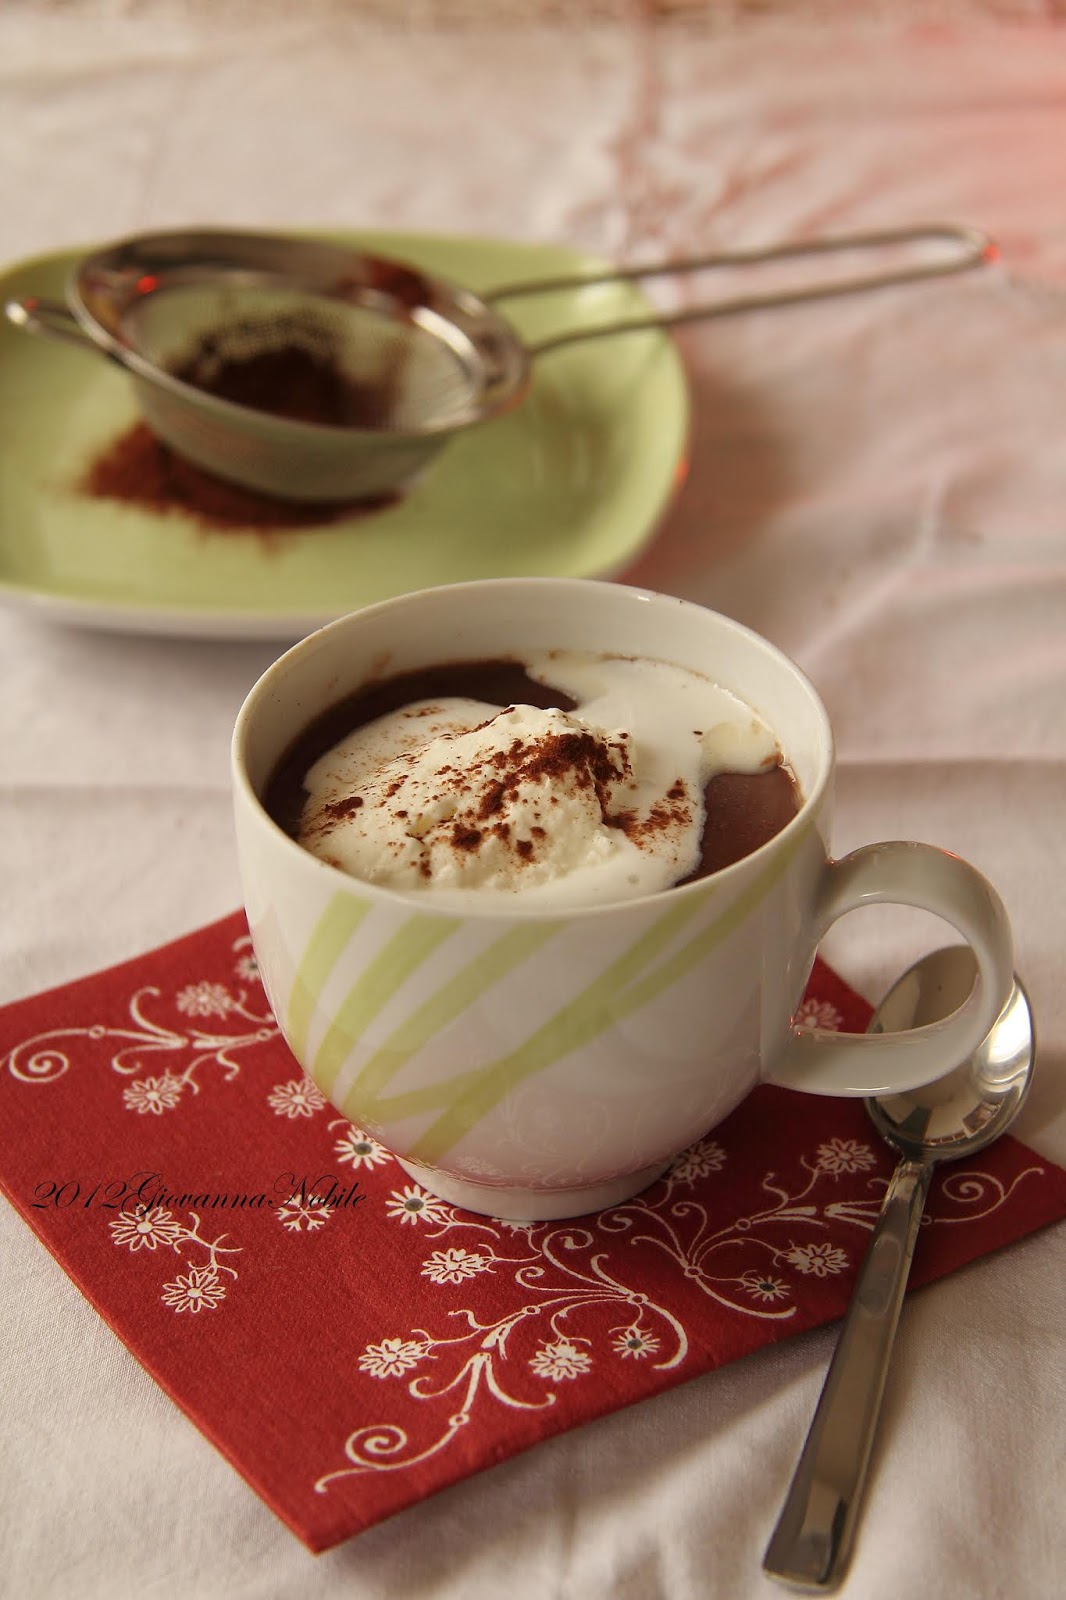 Cioccolata calda con panna - la cuoca eclettica